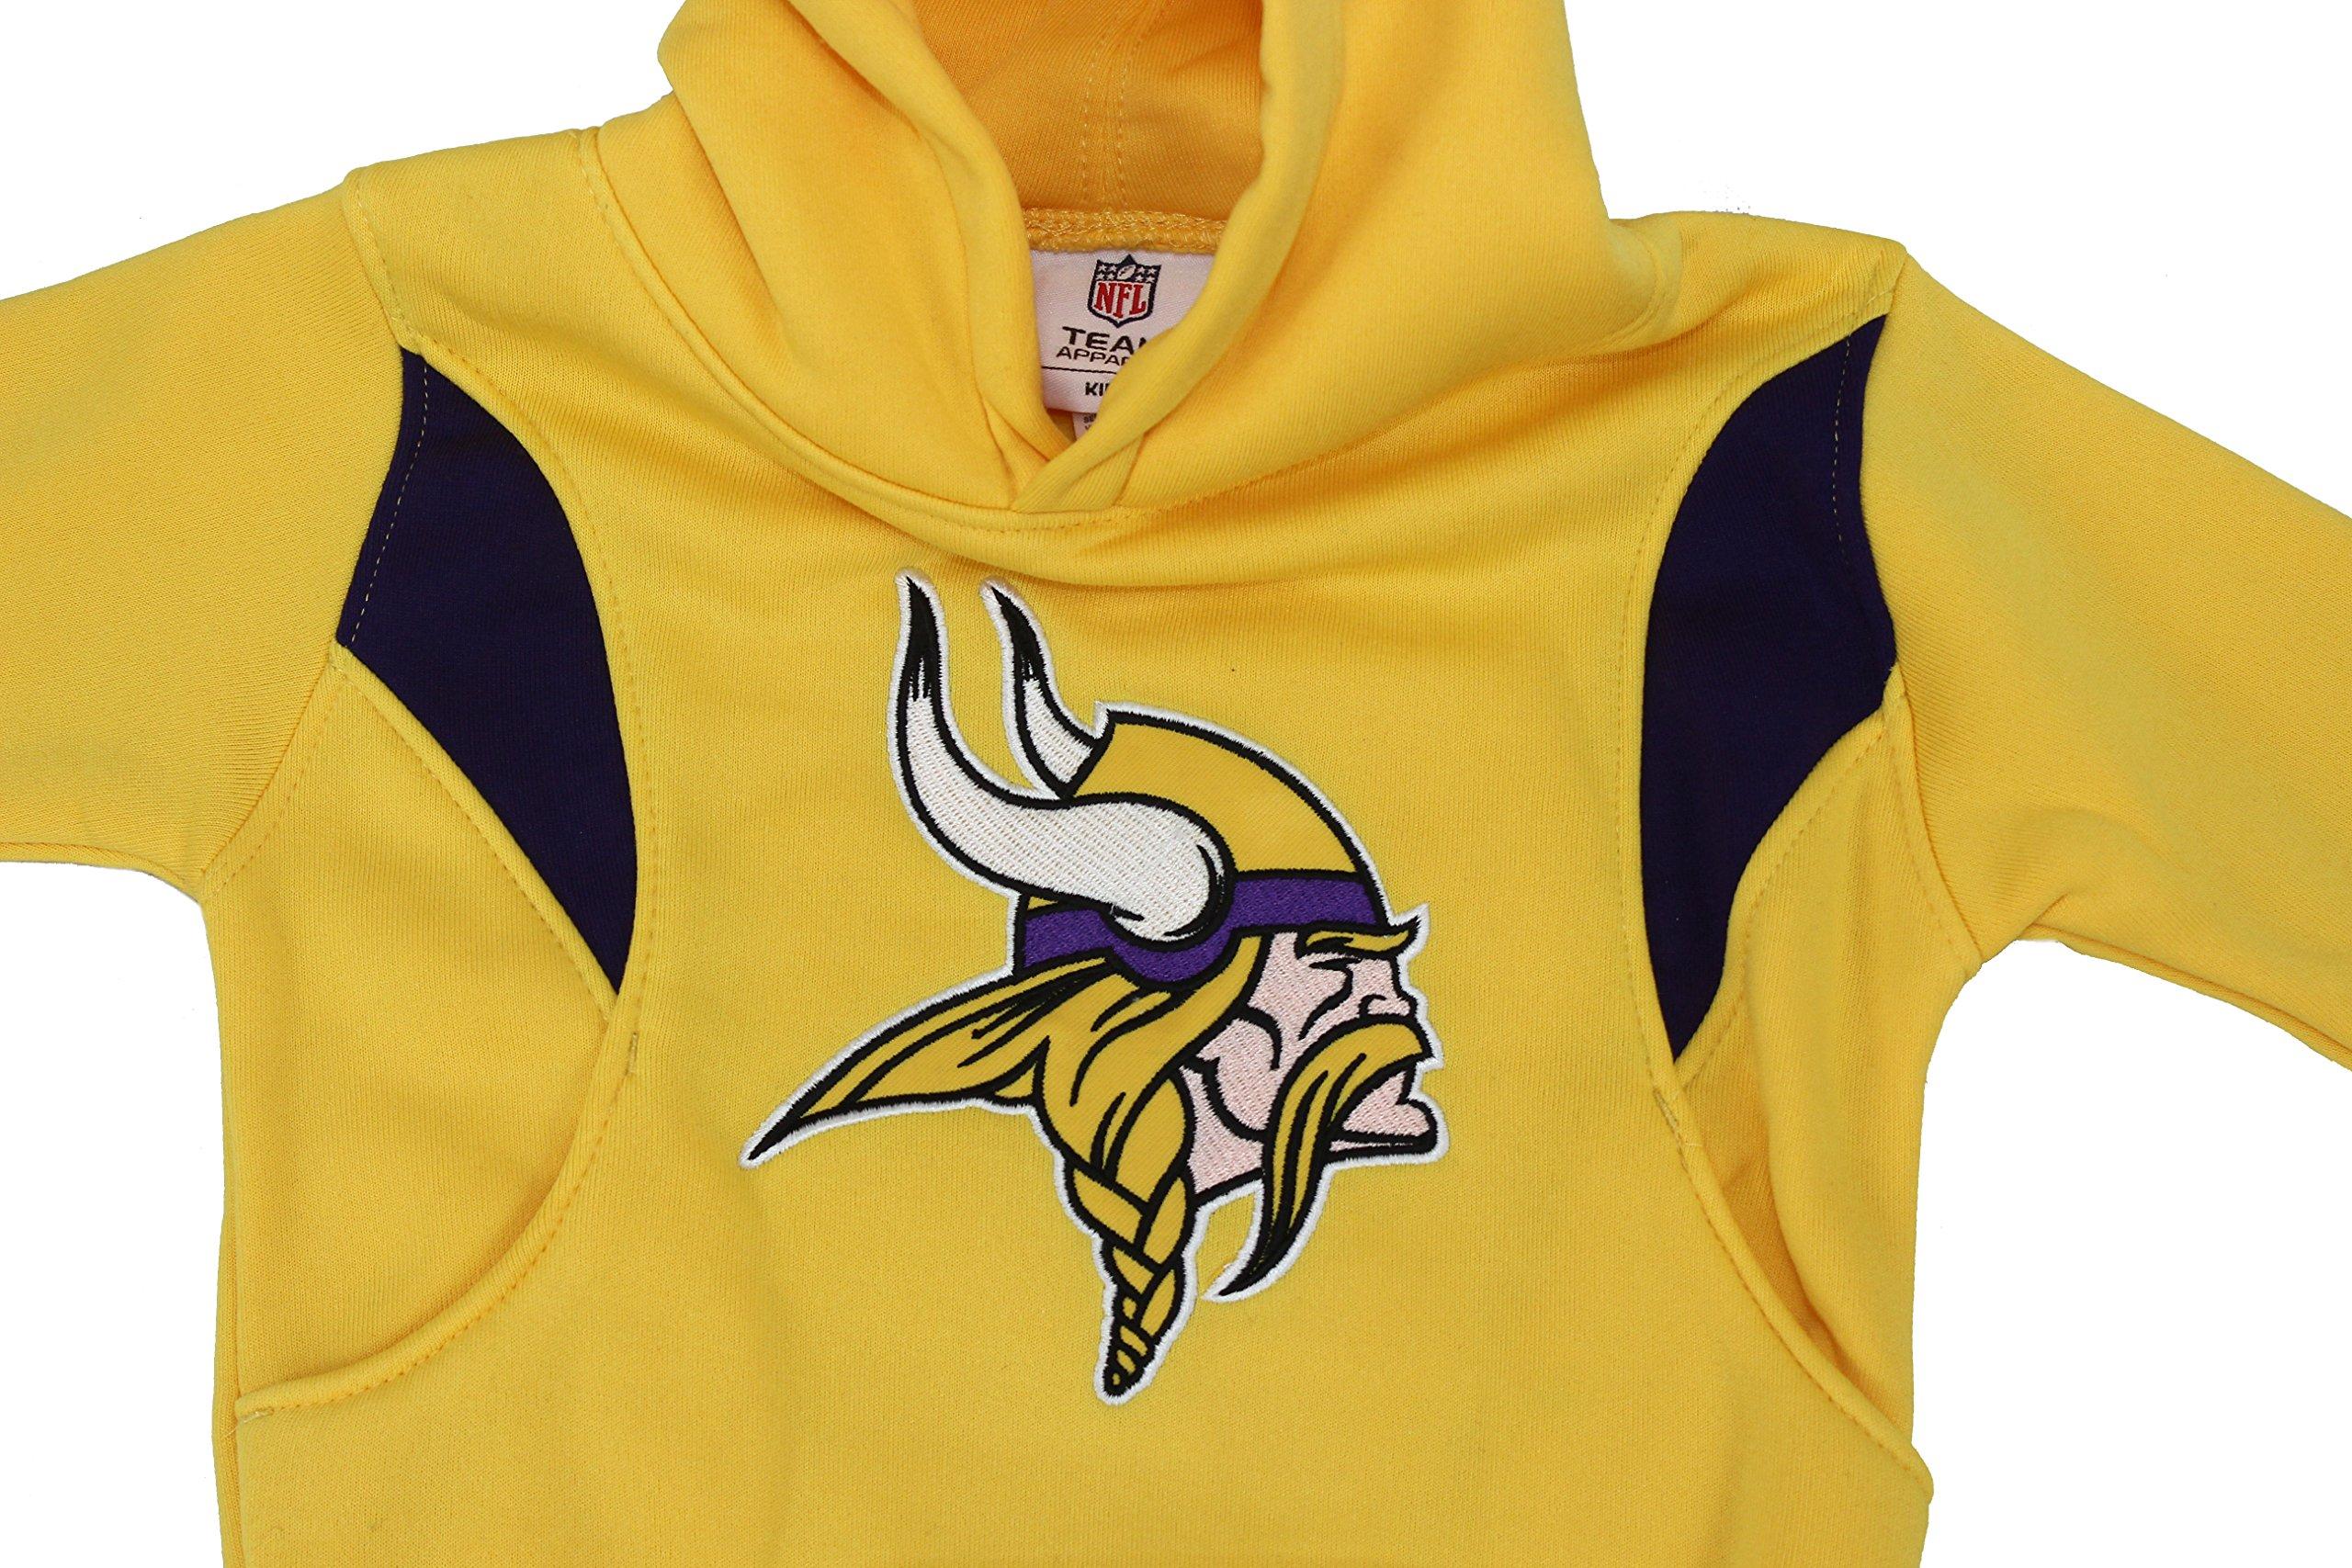 100% authentic f86ab 35fad Team Apparel NFL Boy's Kids Minnesota Vikings Football Embroidered Hoodie  Sweat Shirt